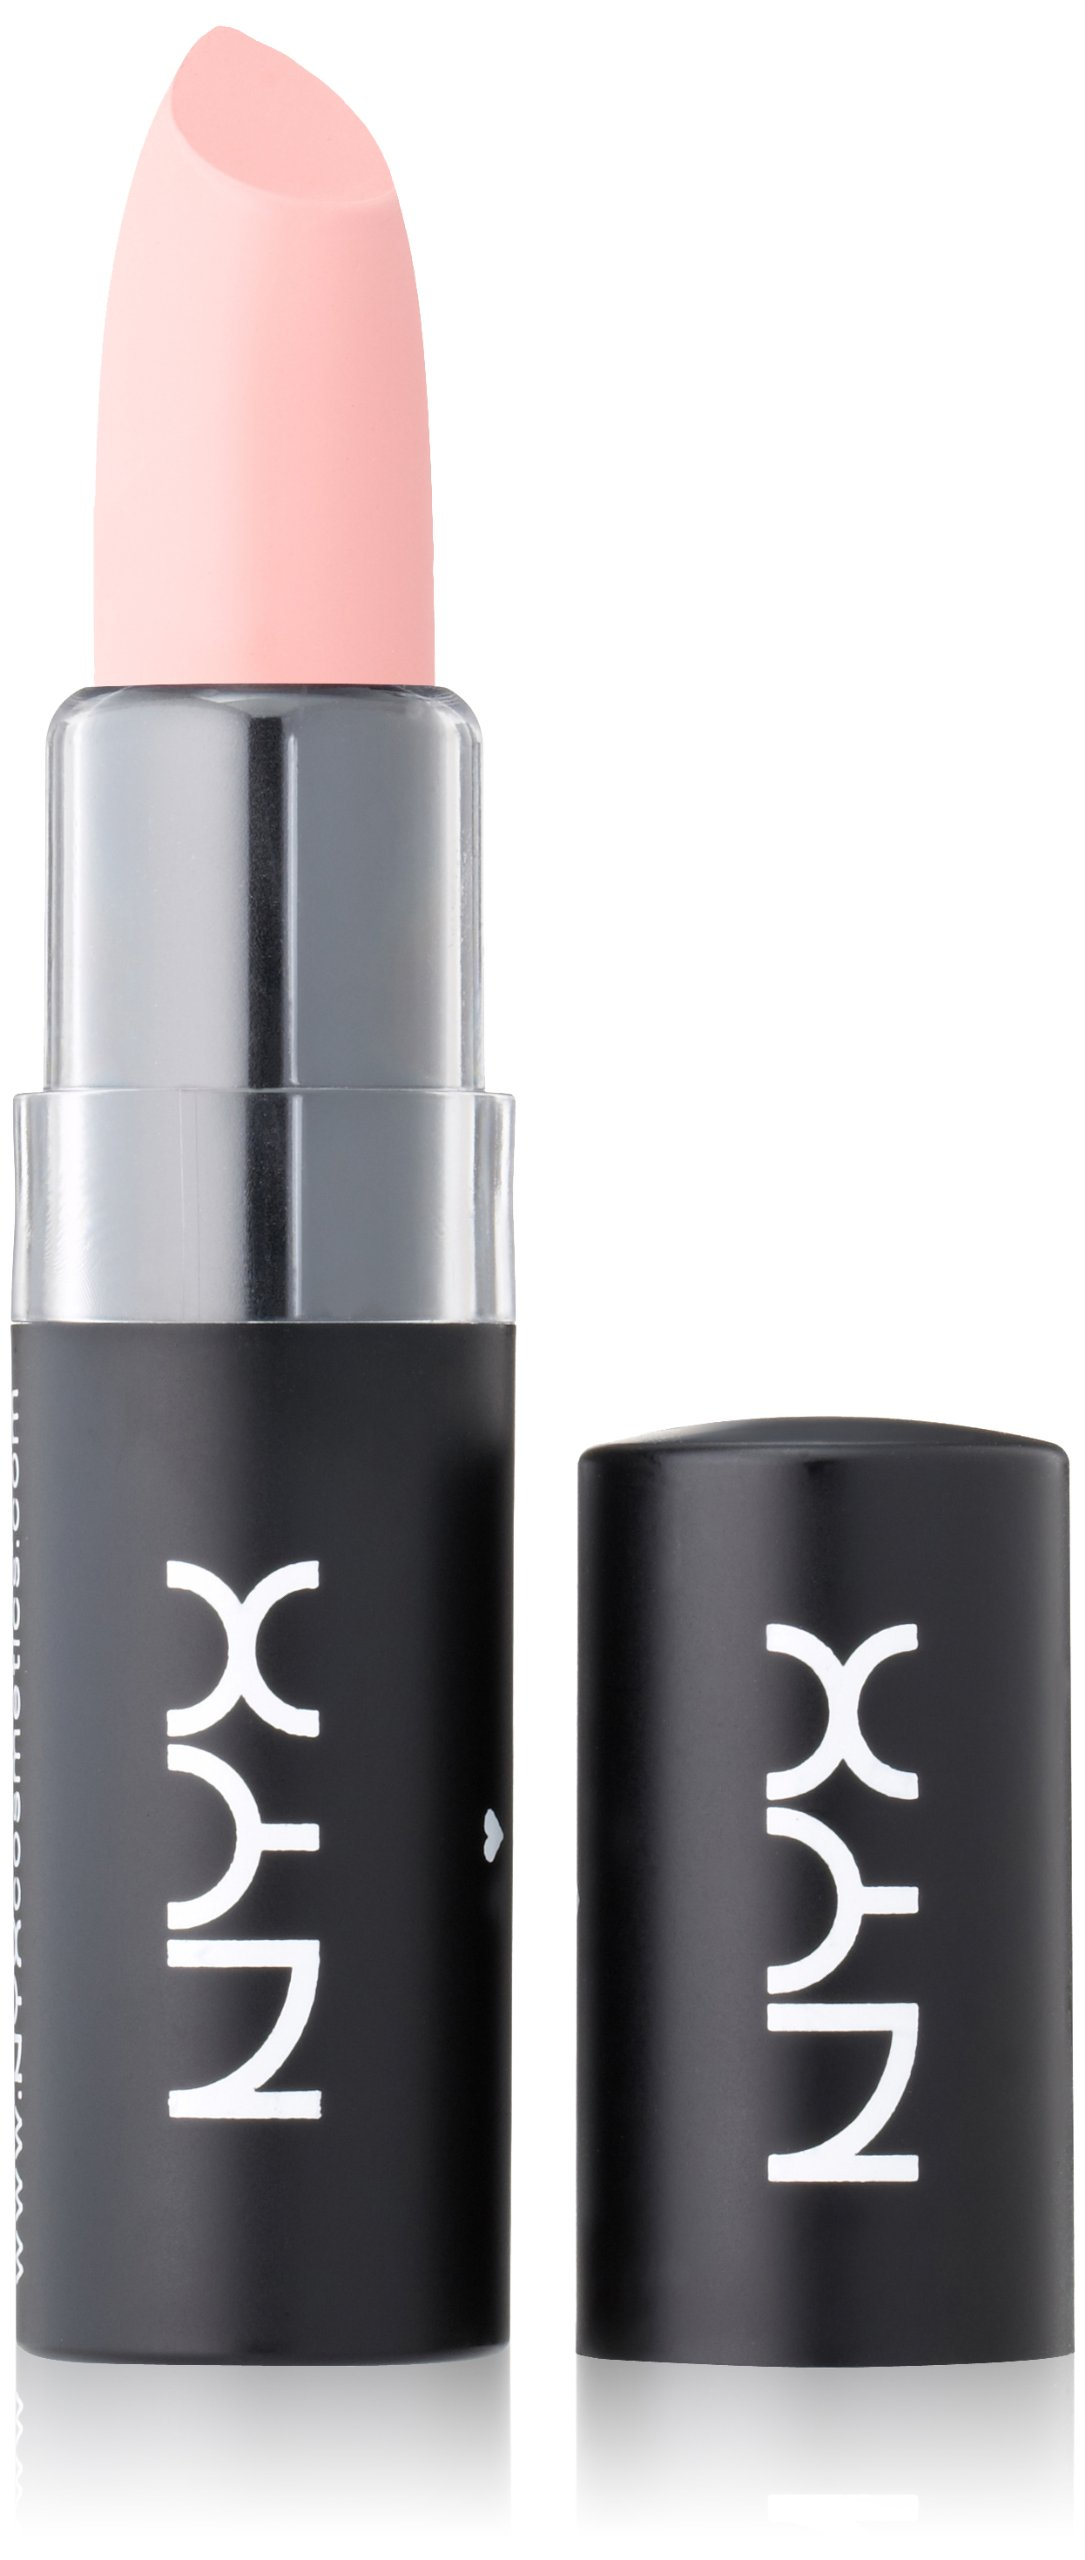 Nyx As Kylie Dupes For 10: Amazon.com : NYX Cosmetics Extra Creamy Round Lipstick